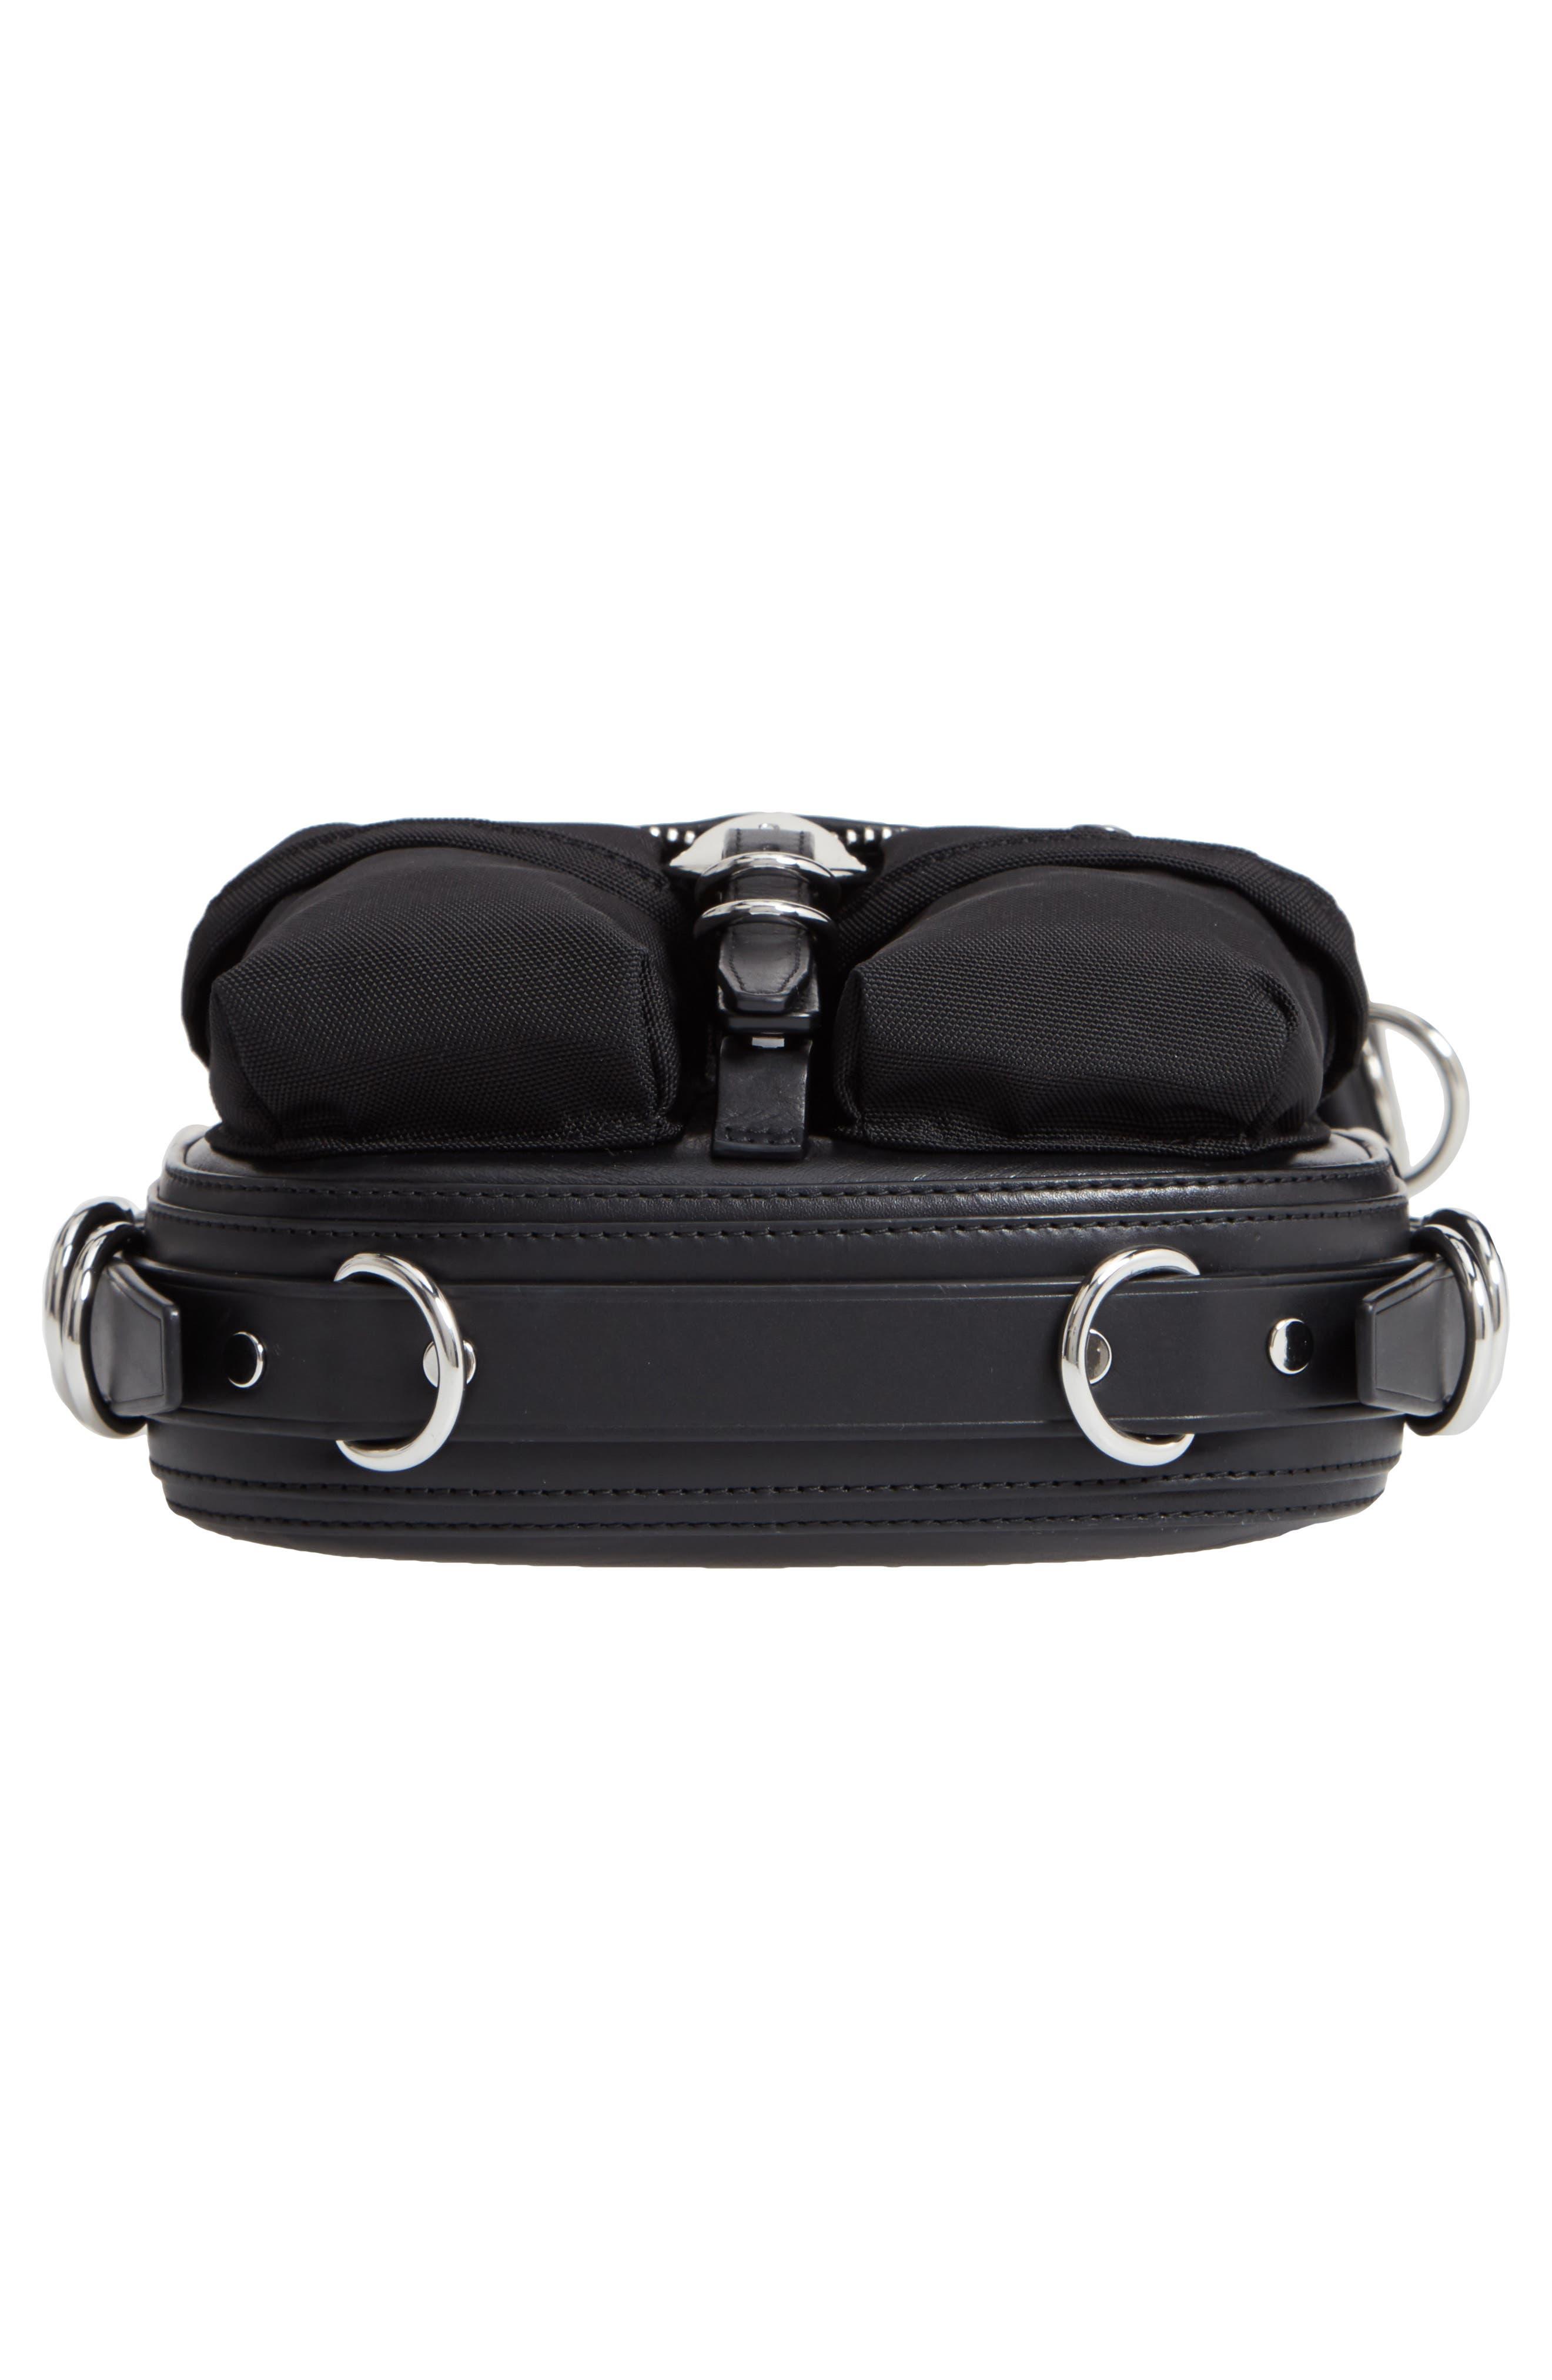 Rove Mixed Media Crossbody Bag,                             Alternate thumbnail 6, color,                             BLACK